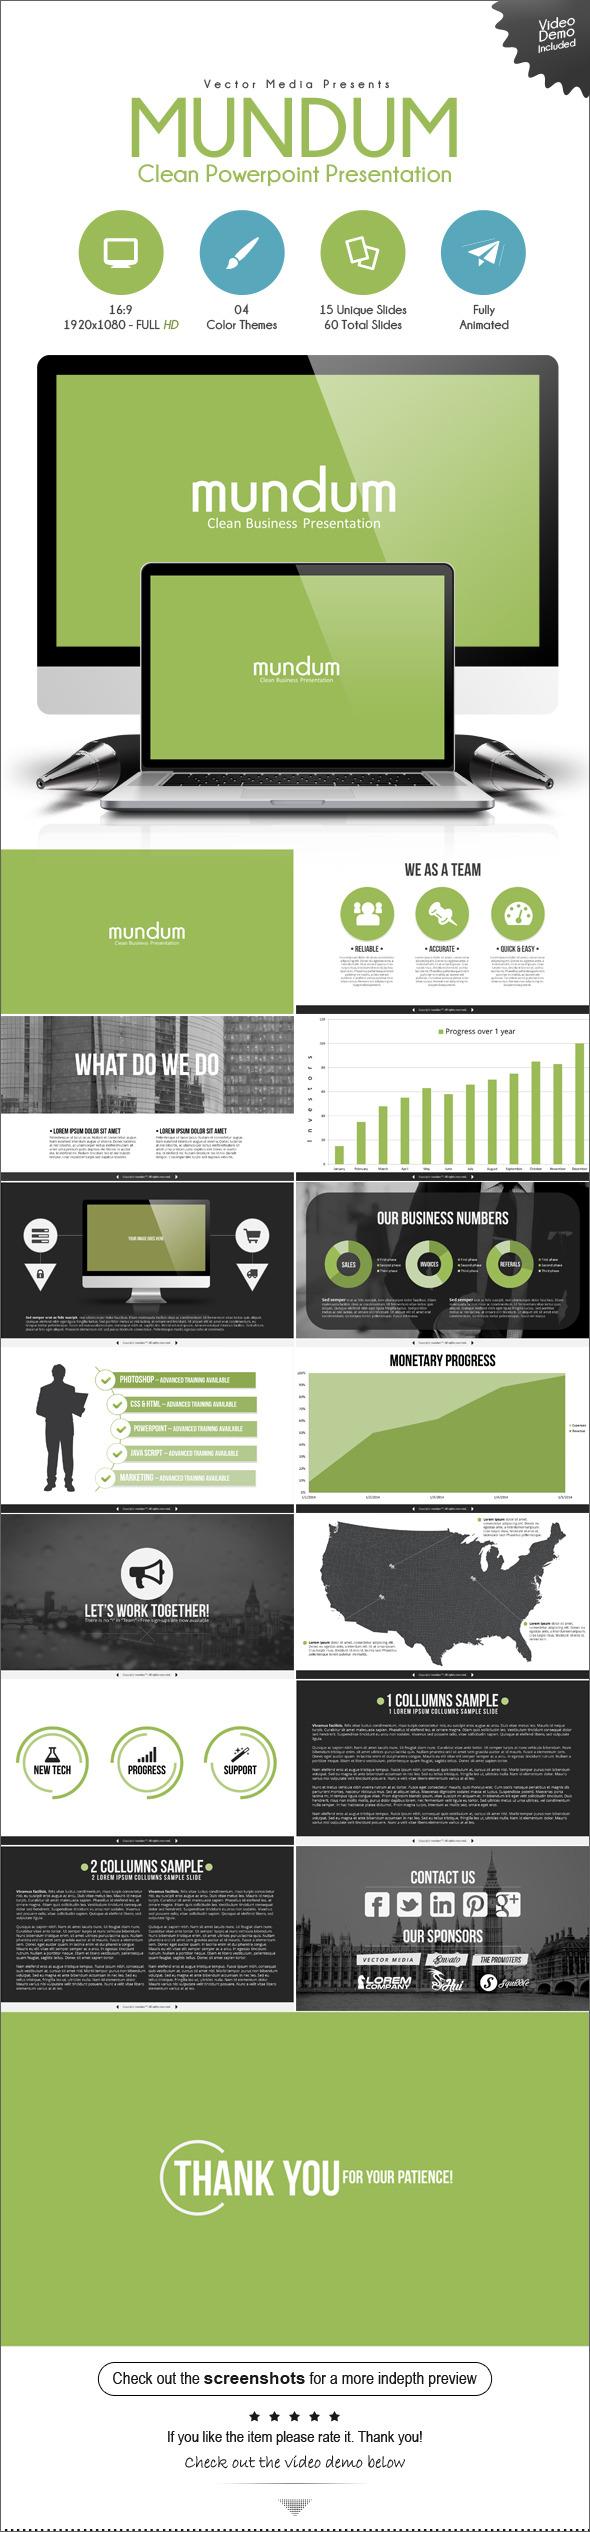 Mundum - Powerpoint Presentation - Business PowerPoint Templates